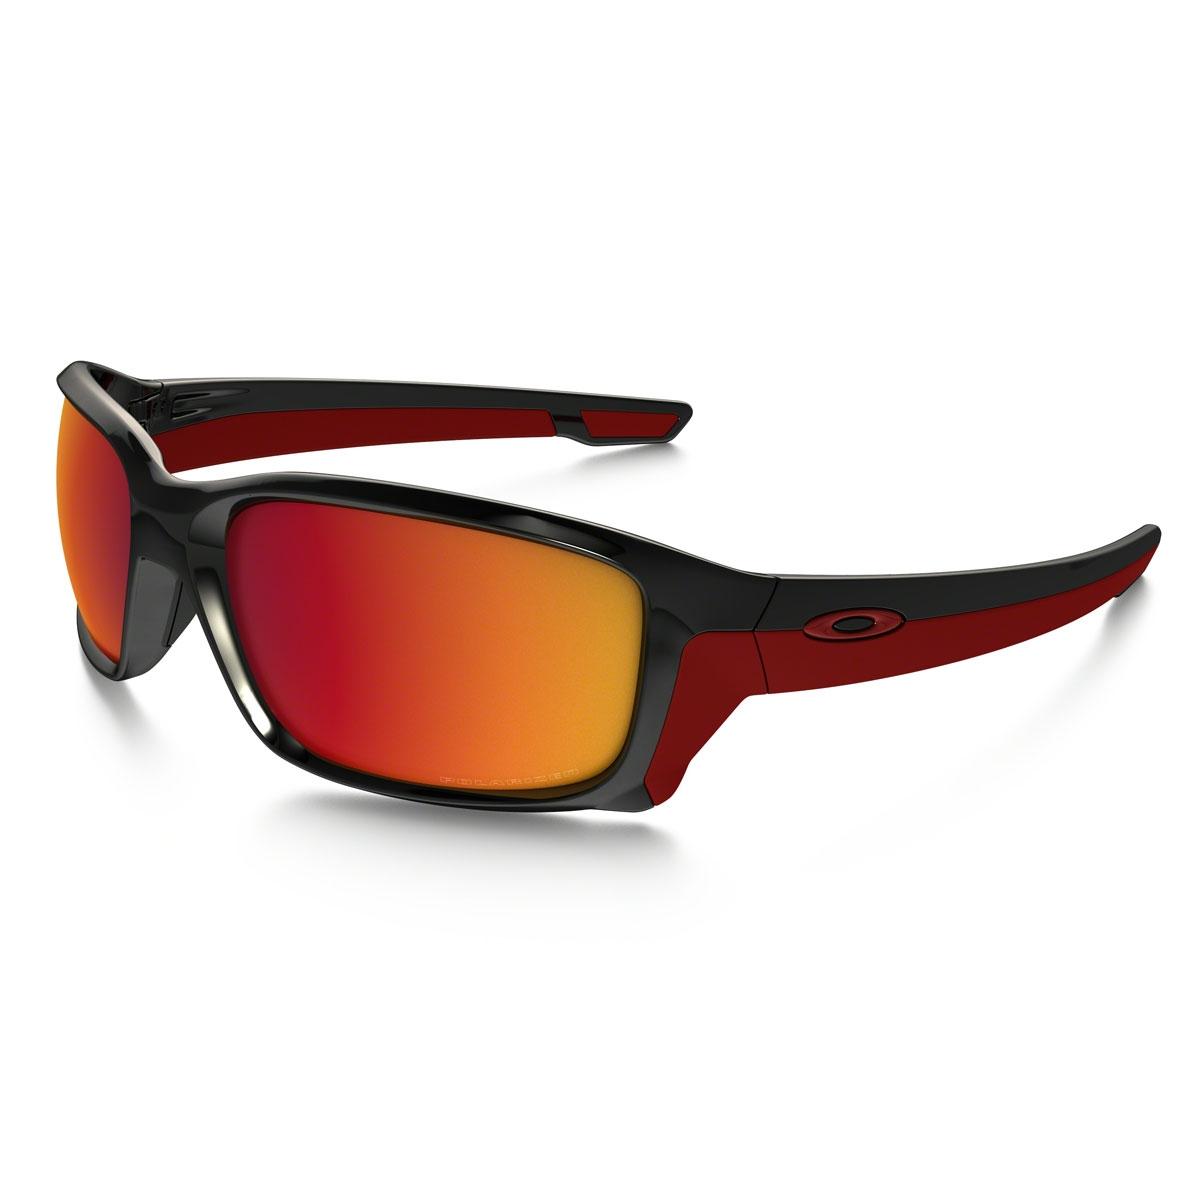 455cbb48dfe Image of Oakley Straightlink Polarized Men s Sunglasses - Polished Black  Frame Torch Iridium Polarized Lens